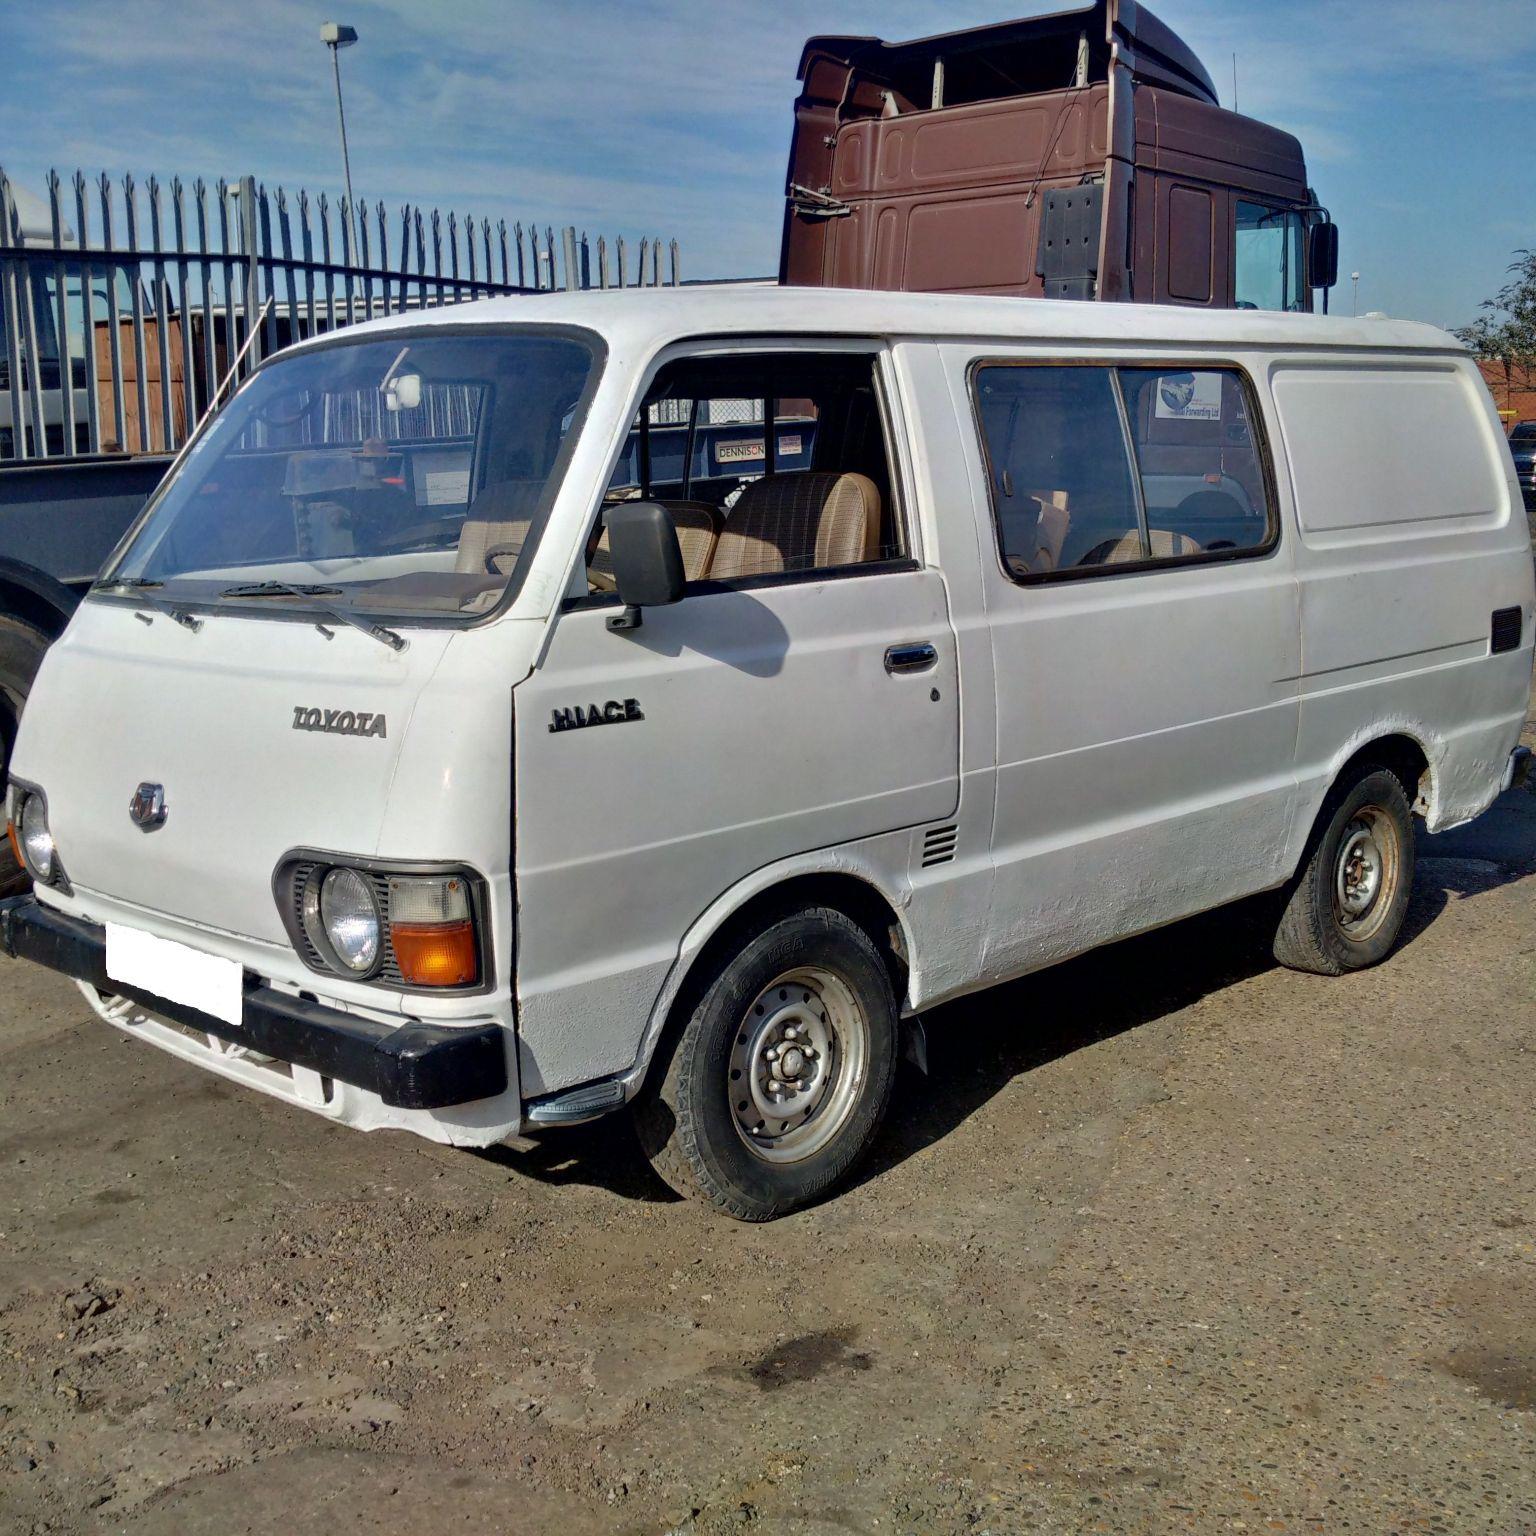 Left hand drive Toyota Hiace LH20 long wheel base mini bus. 1 L engine.